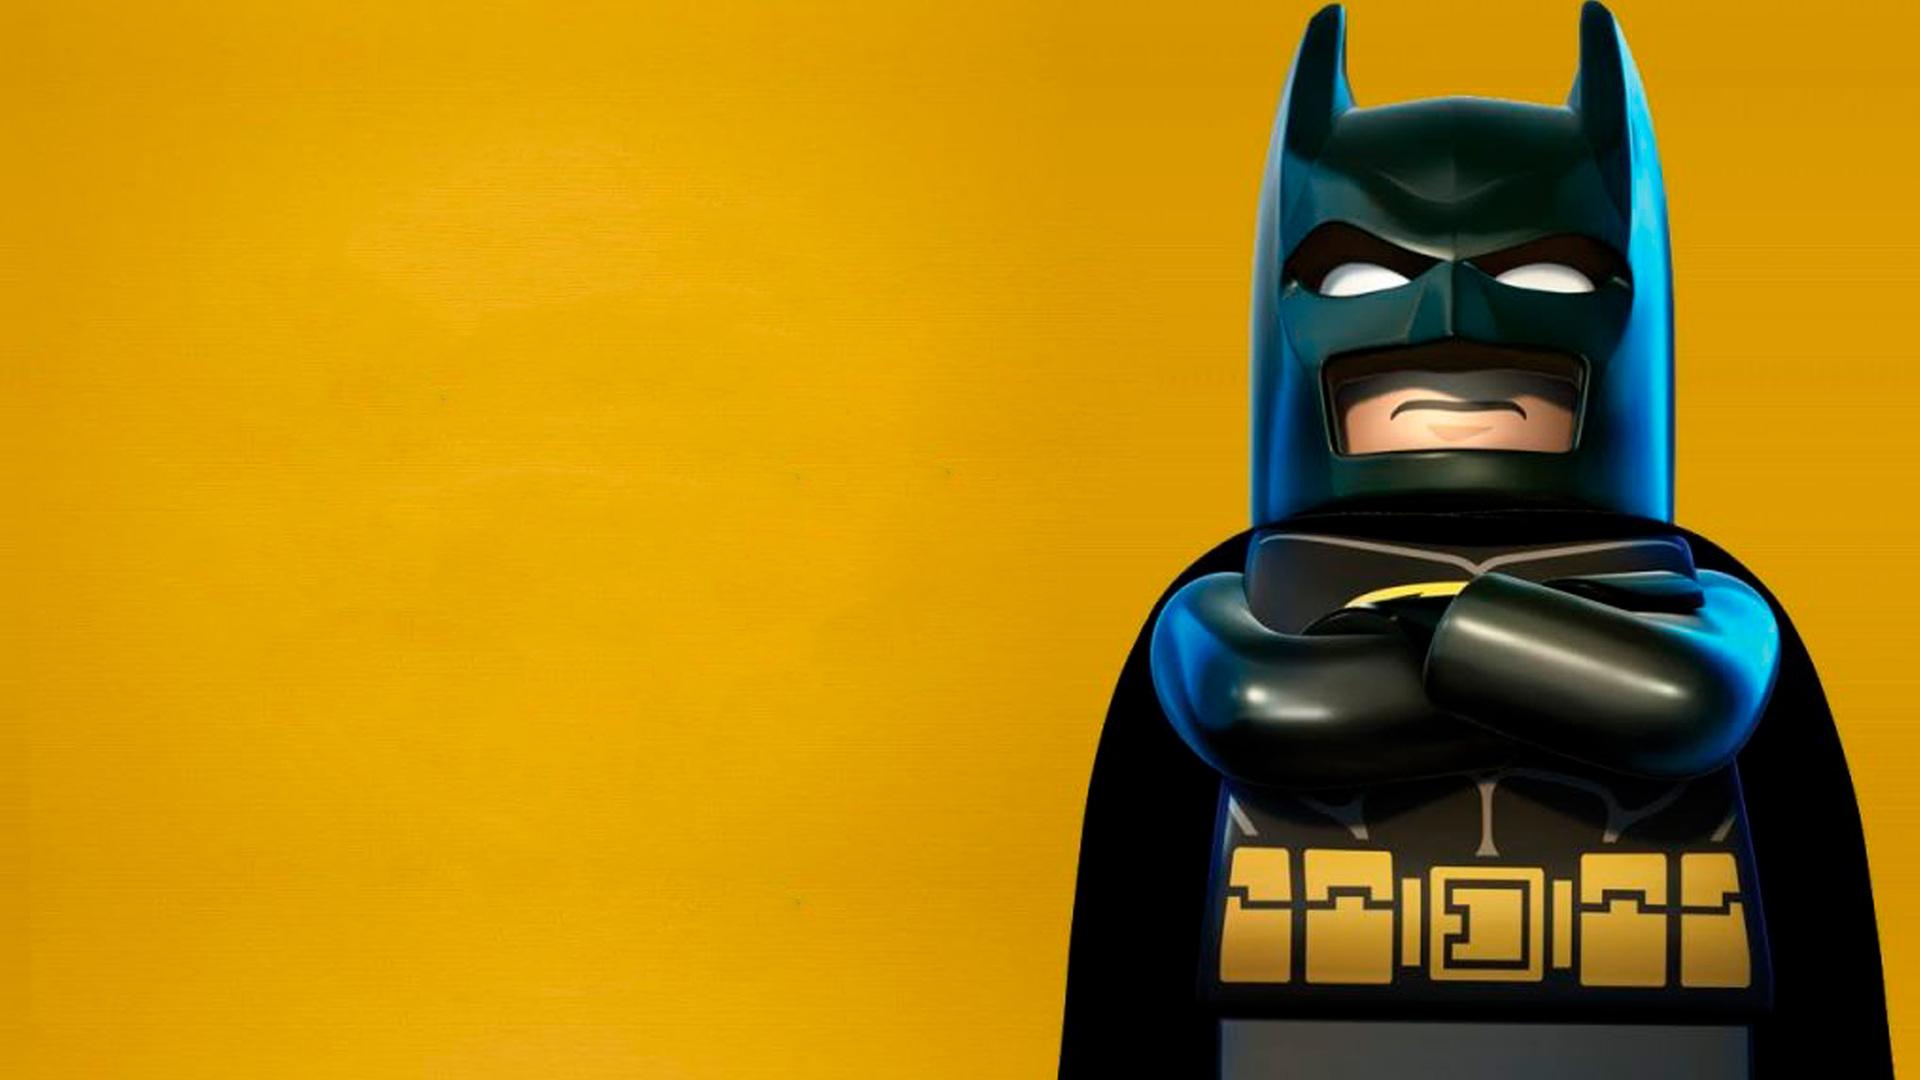 1920x1080 Lego Batman Laptop Full HD 1080P HD 4k ...